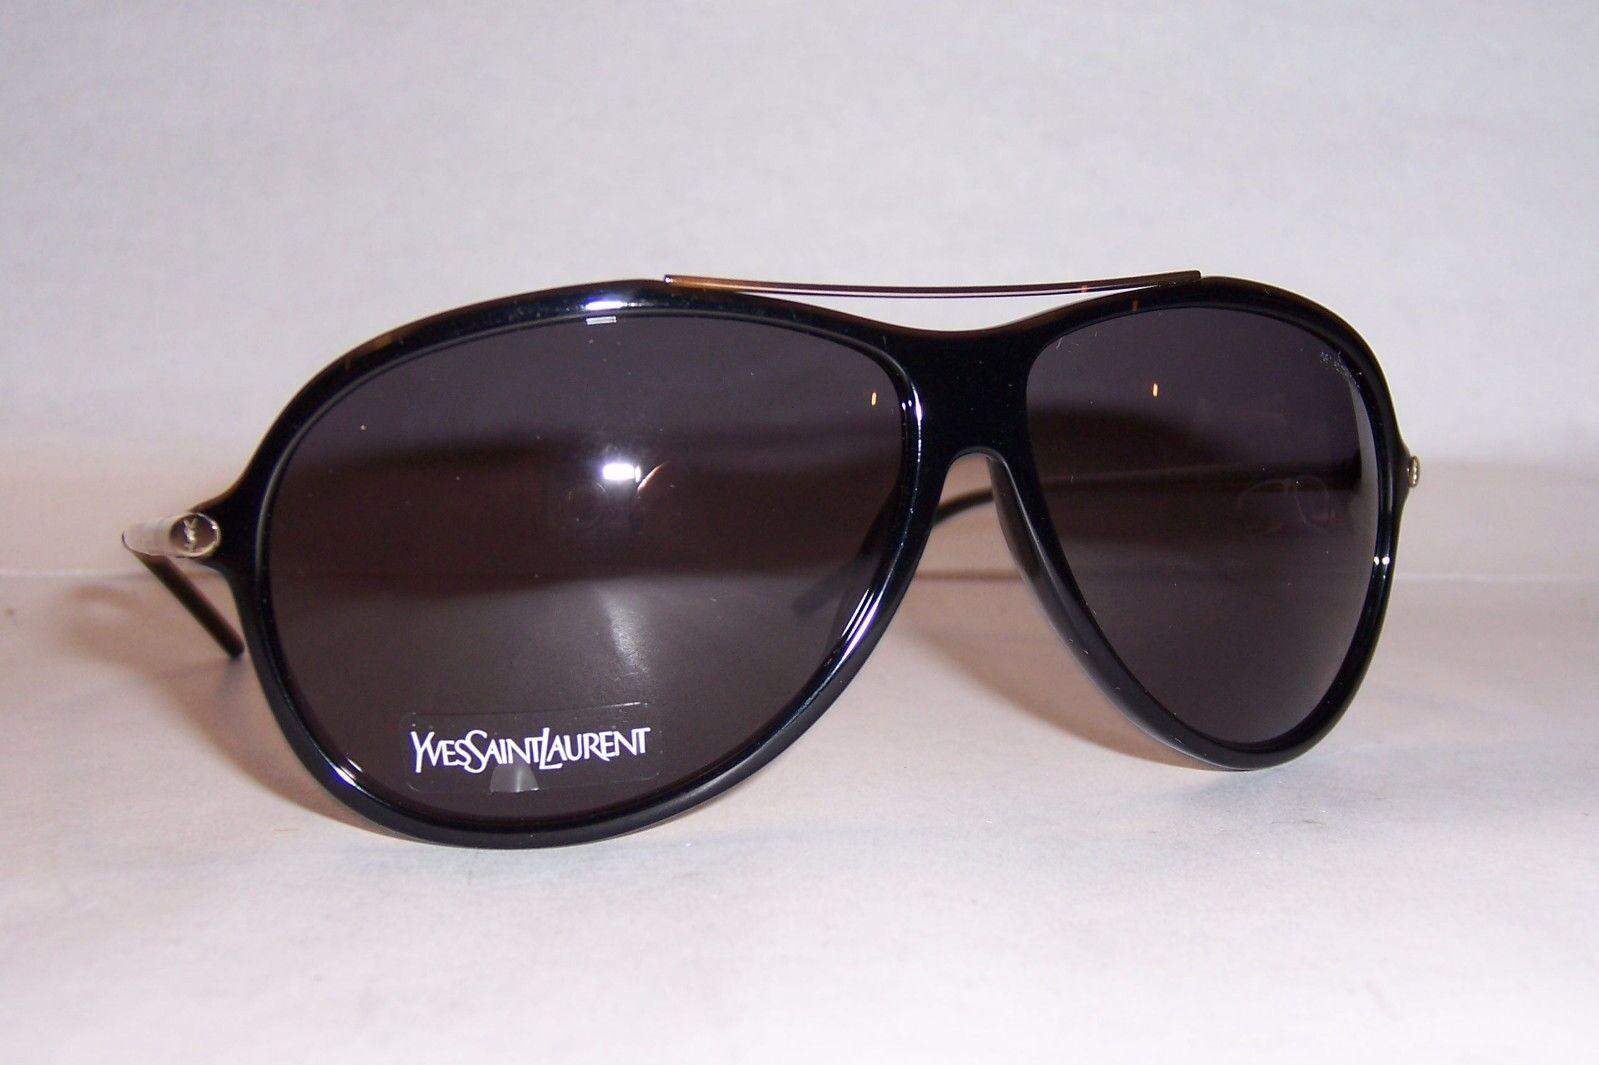 0b70fe45a7 Yves Saint Laurent Sunglasses 2354 s 0rhp Black 62mm